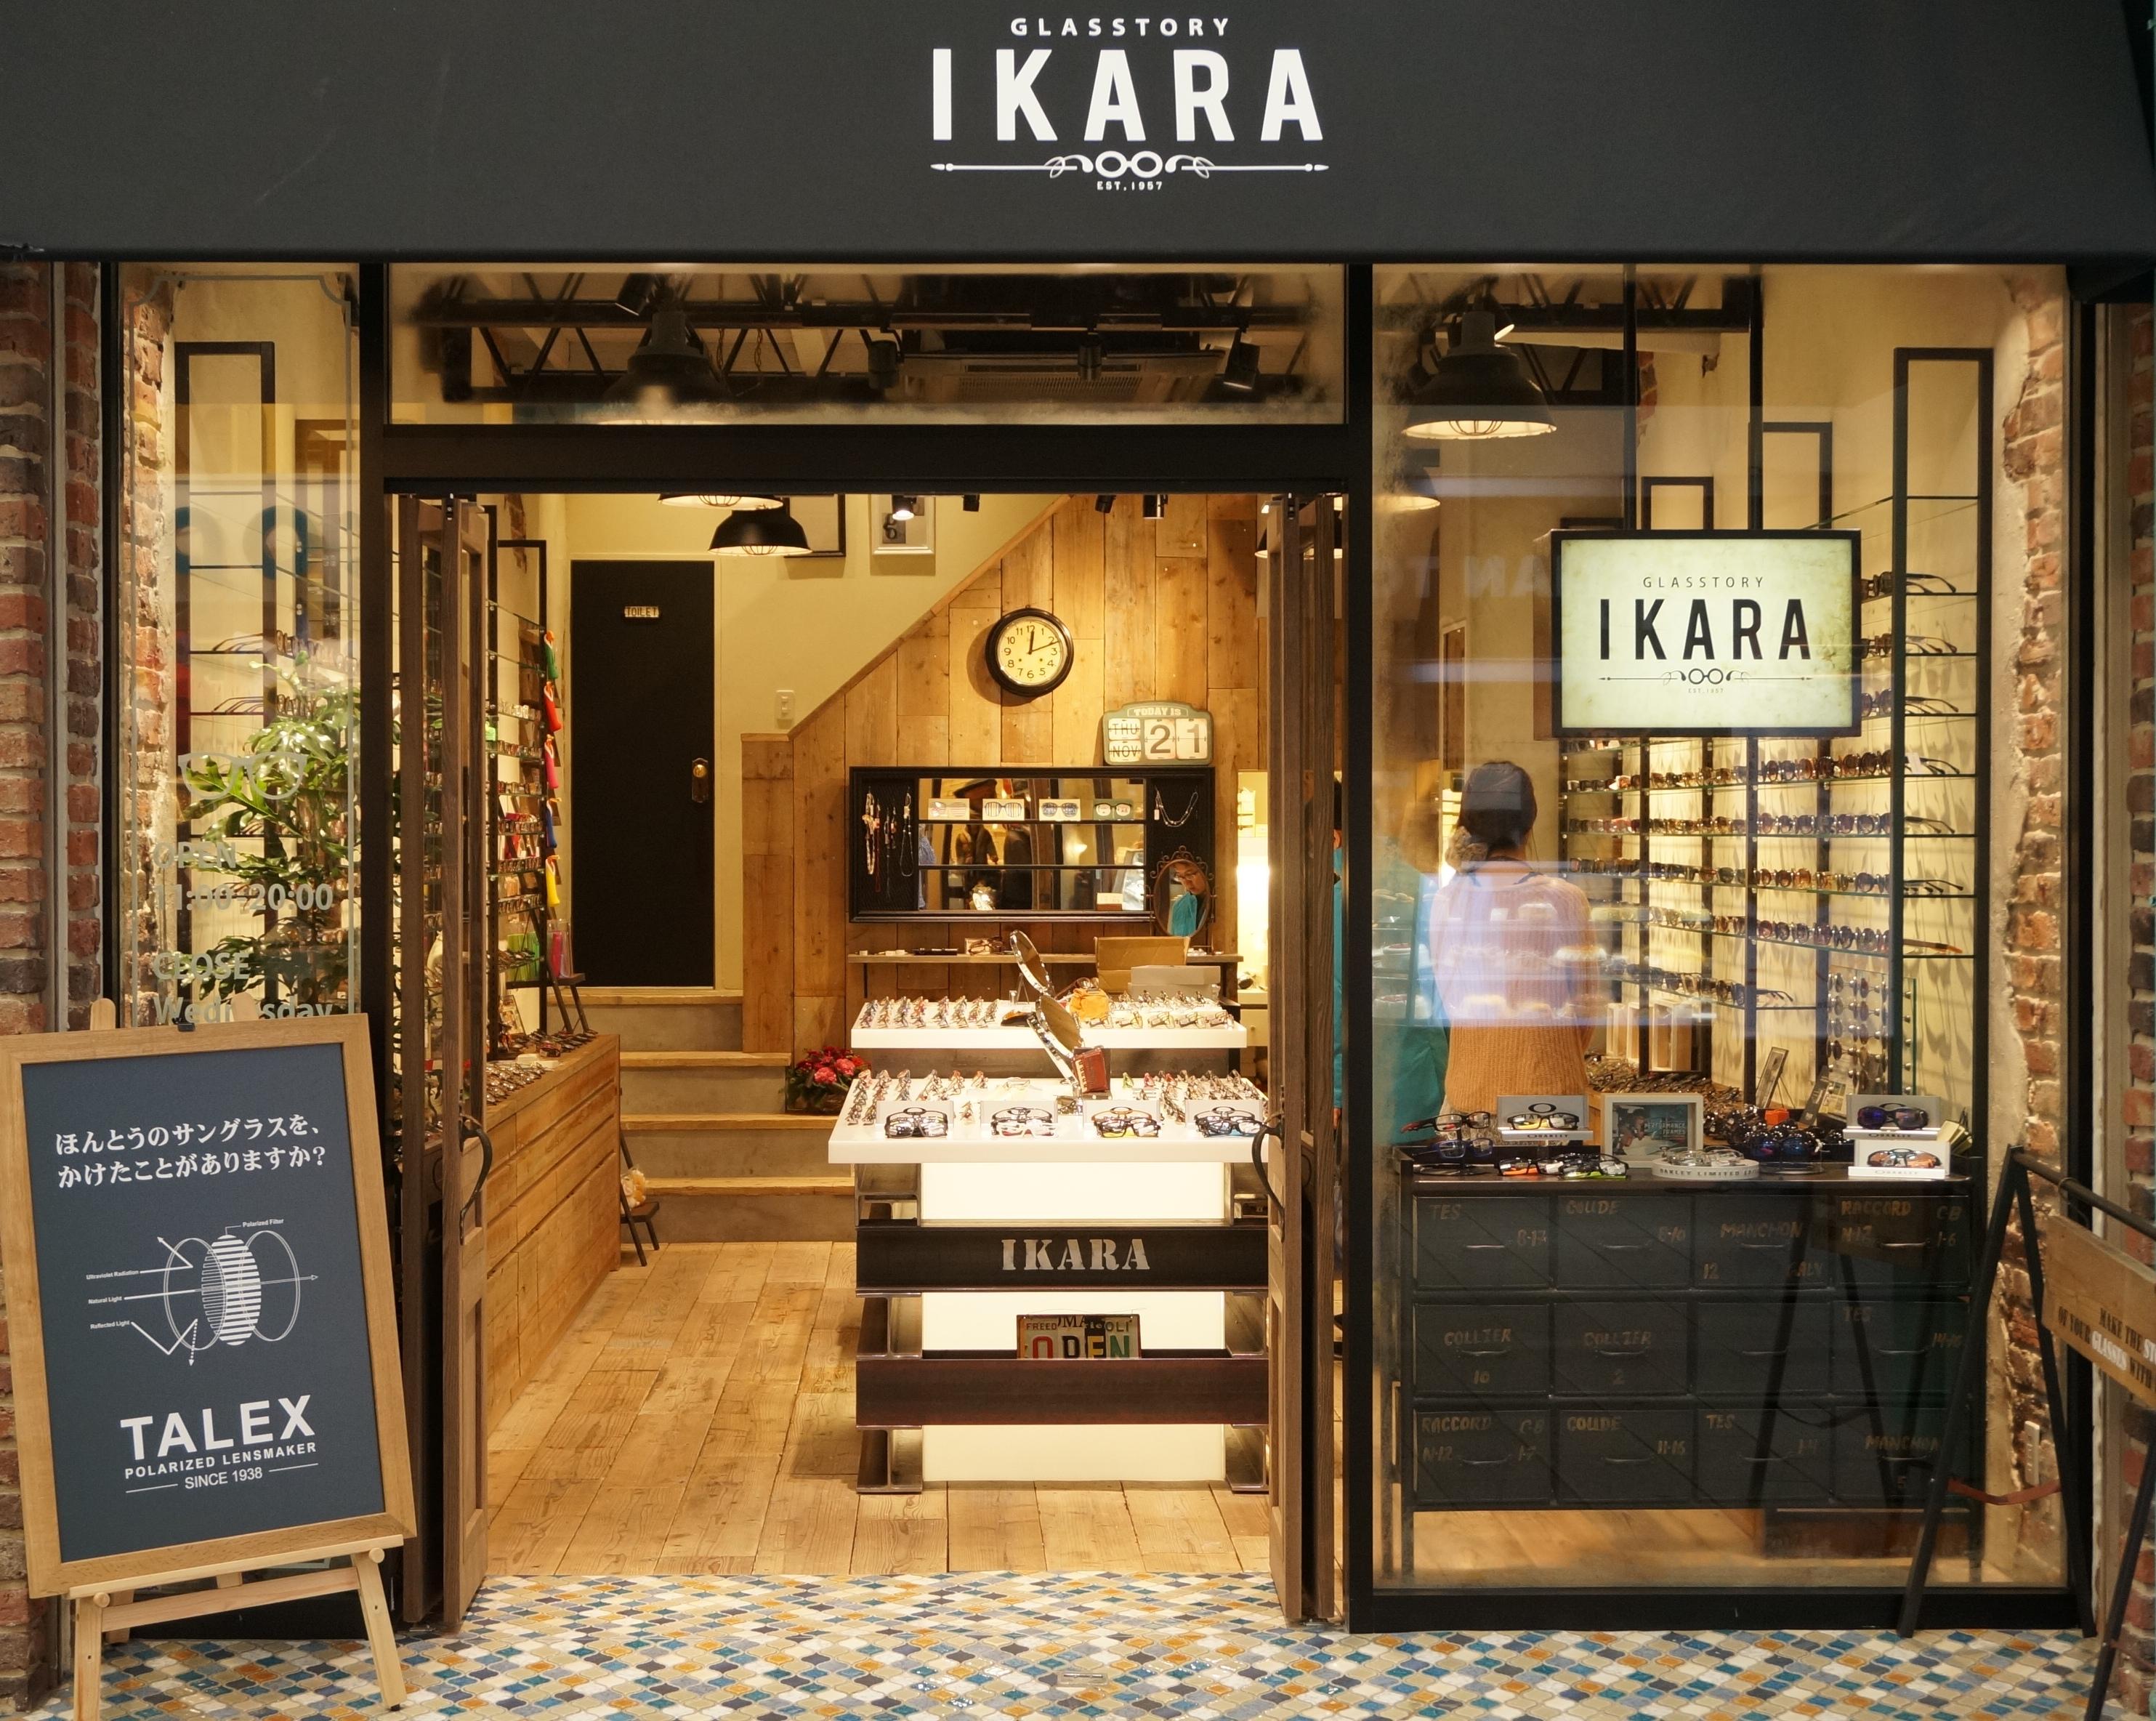 GLASSTORY IKARA(武蔵野市)